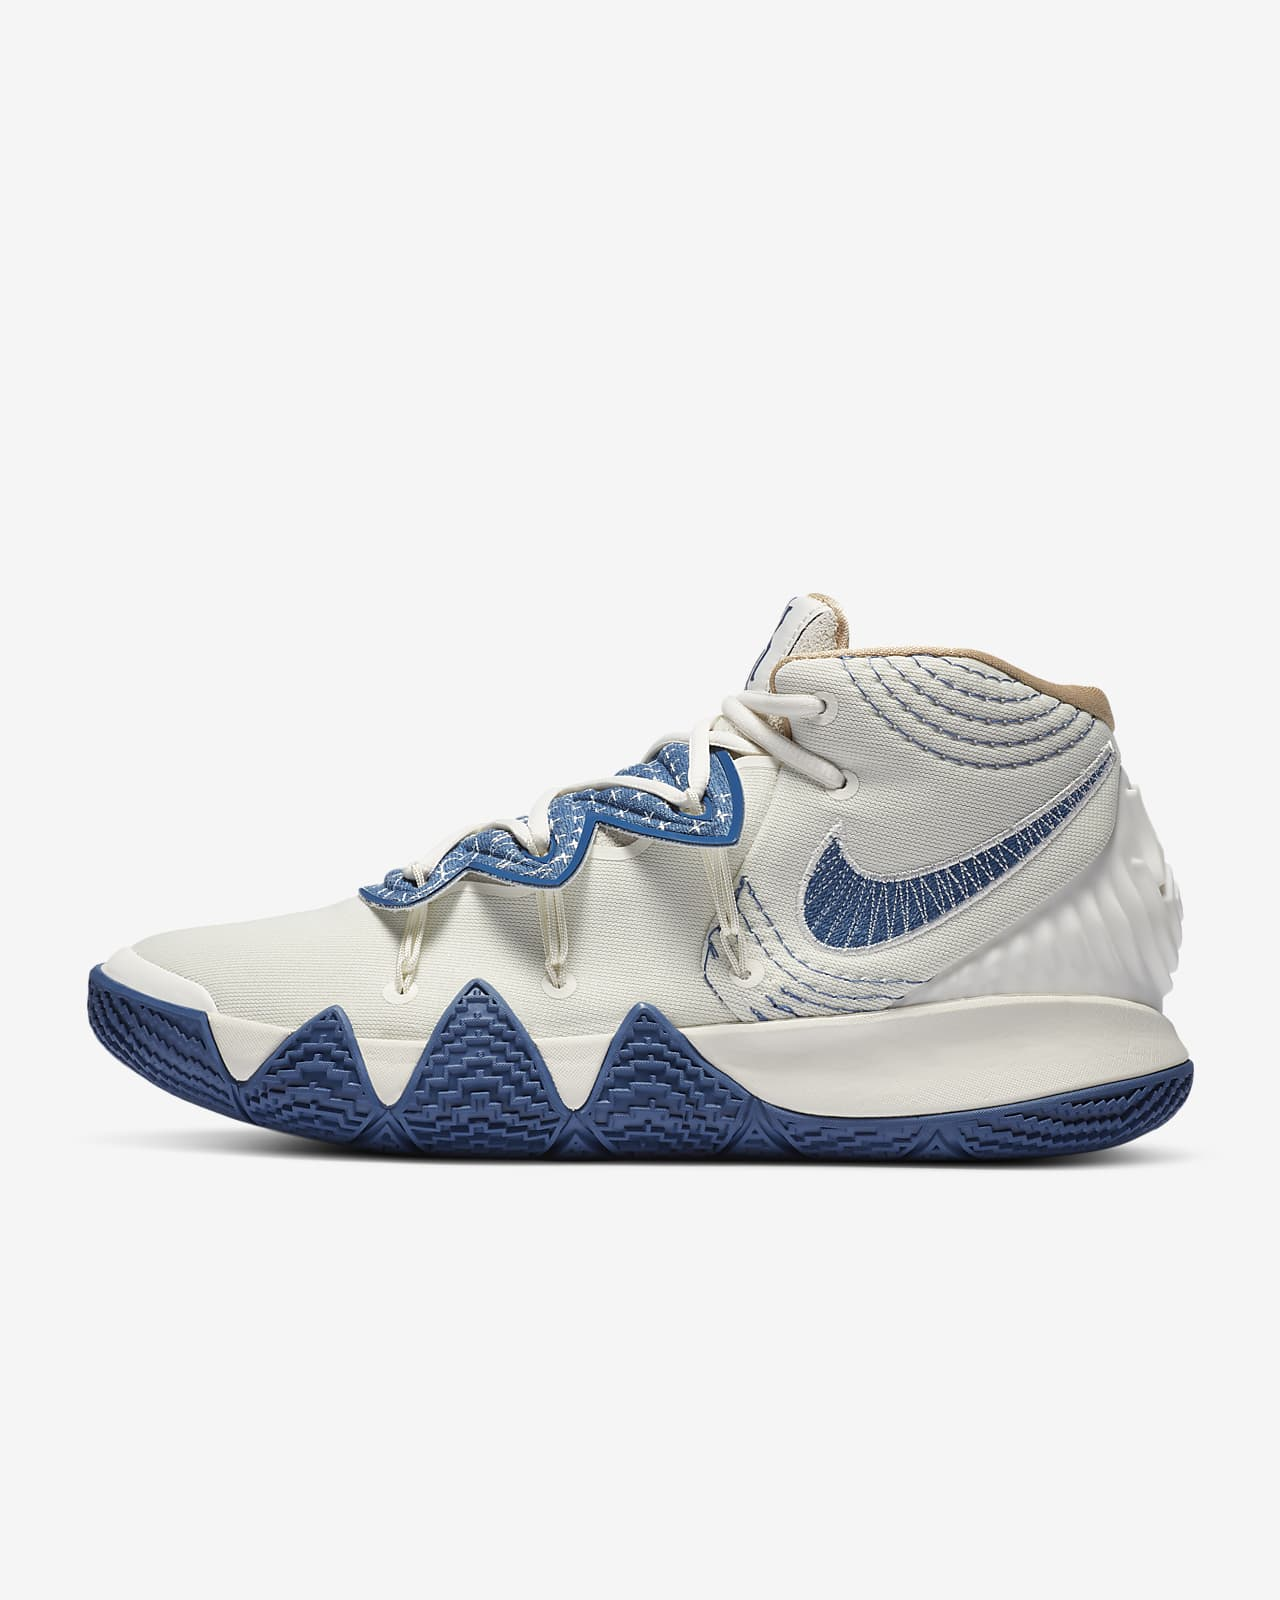 Kybrid S2 'Sashiko' Basketball Shoe